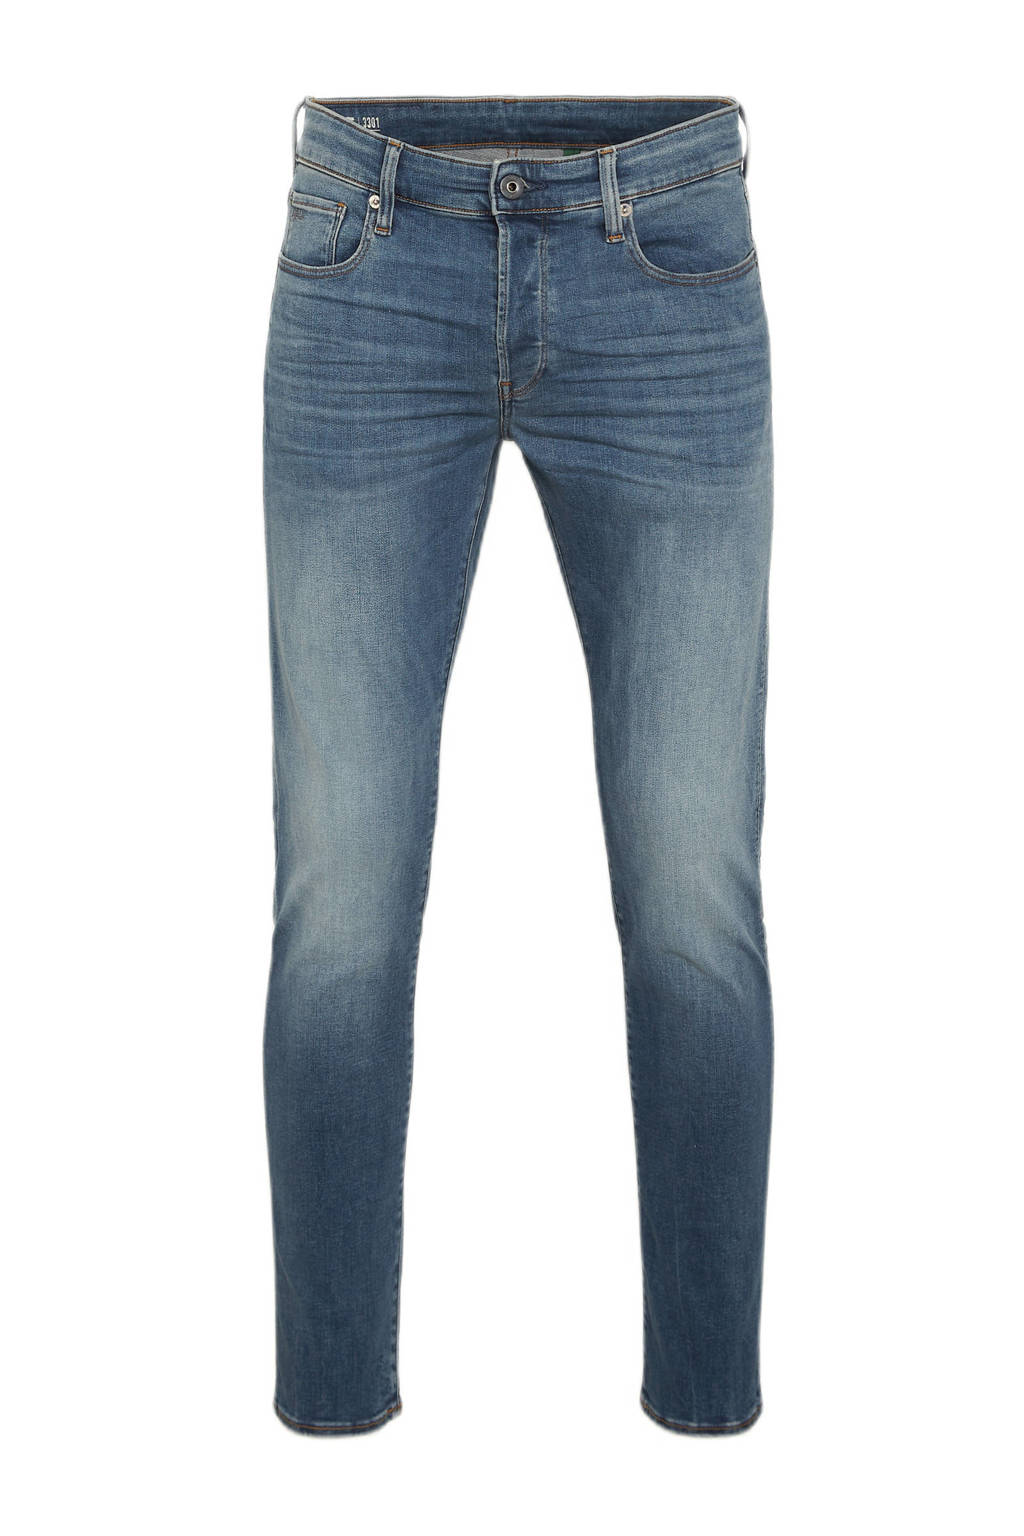 G-Star RAW straight fit jeans 3301, Dark denim